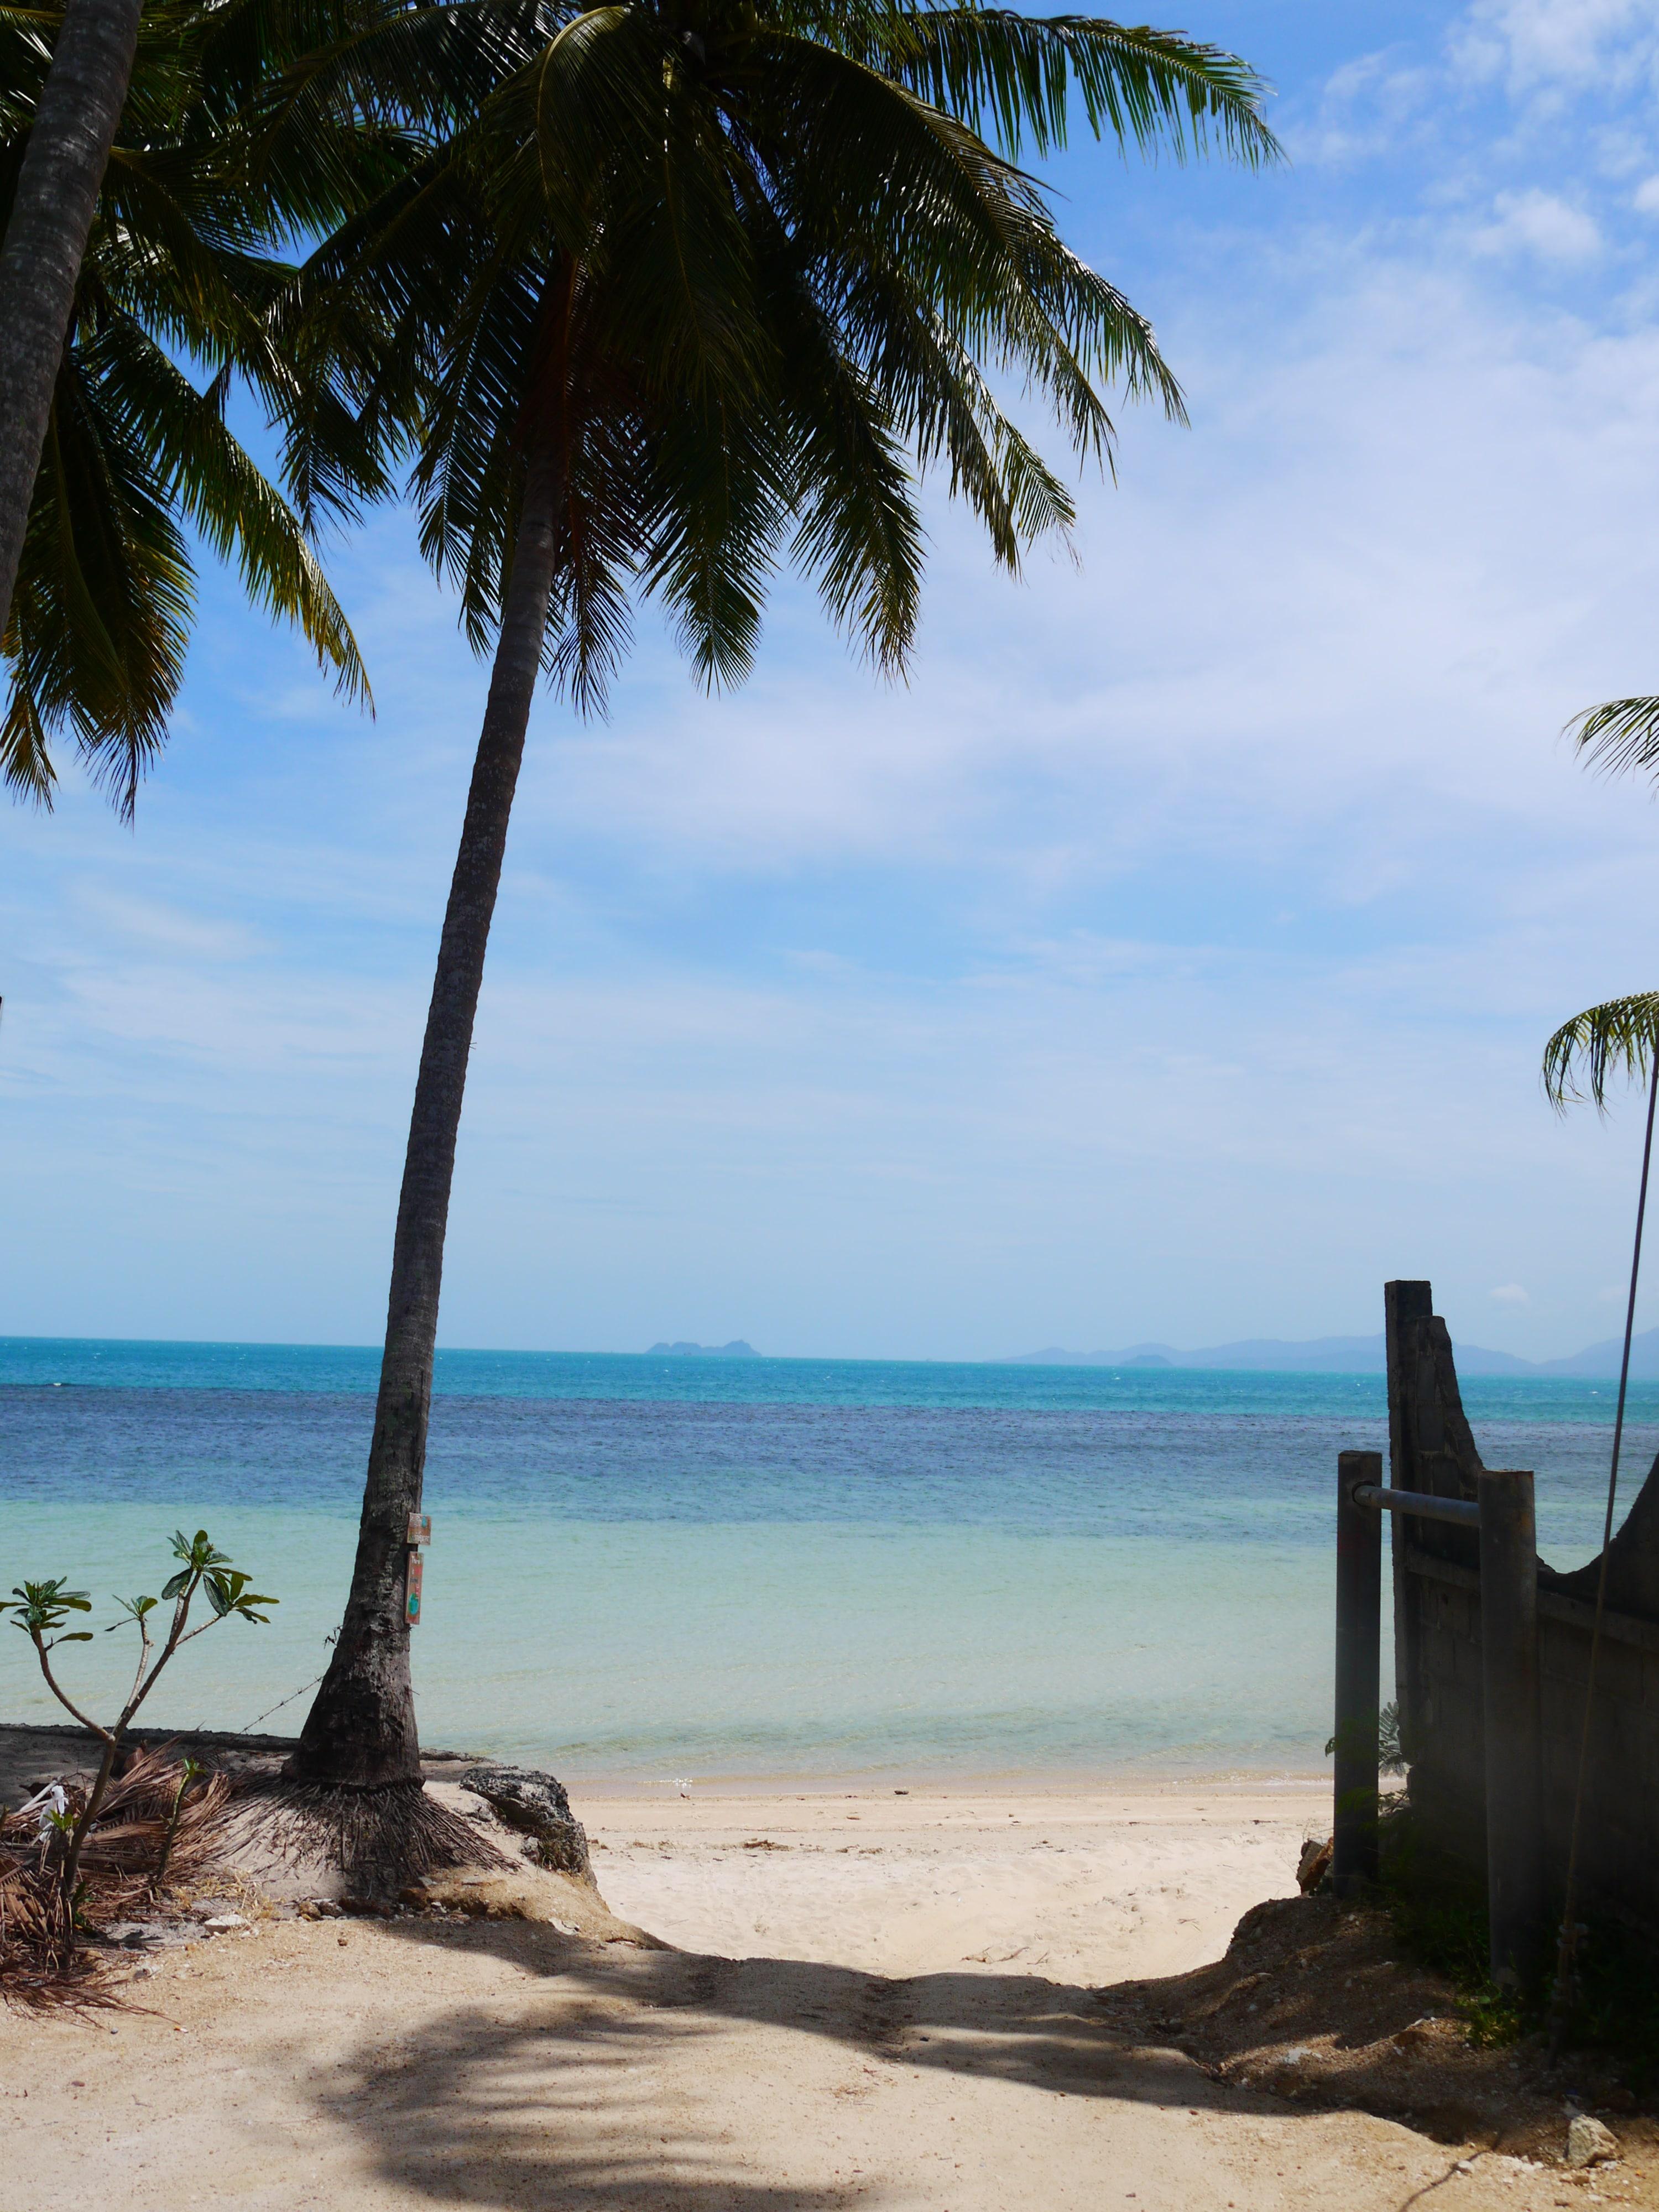 best beaches koh phangan, bottle beach, secret beach koh phangan, malibu beach koh phangan, bottle beach koh phangan, koh phangan beaches, snorkeling koh phangan